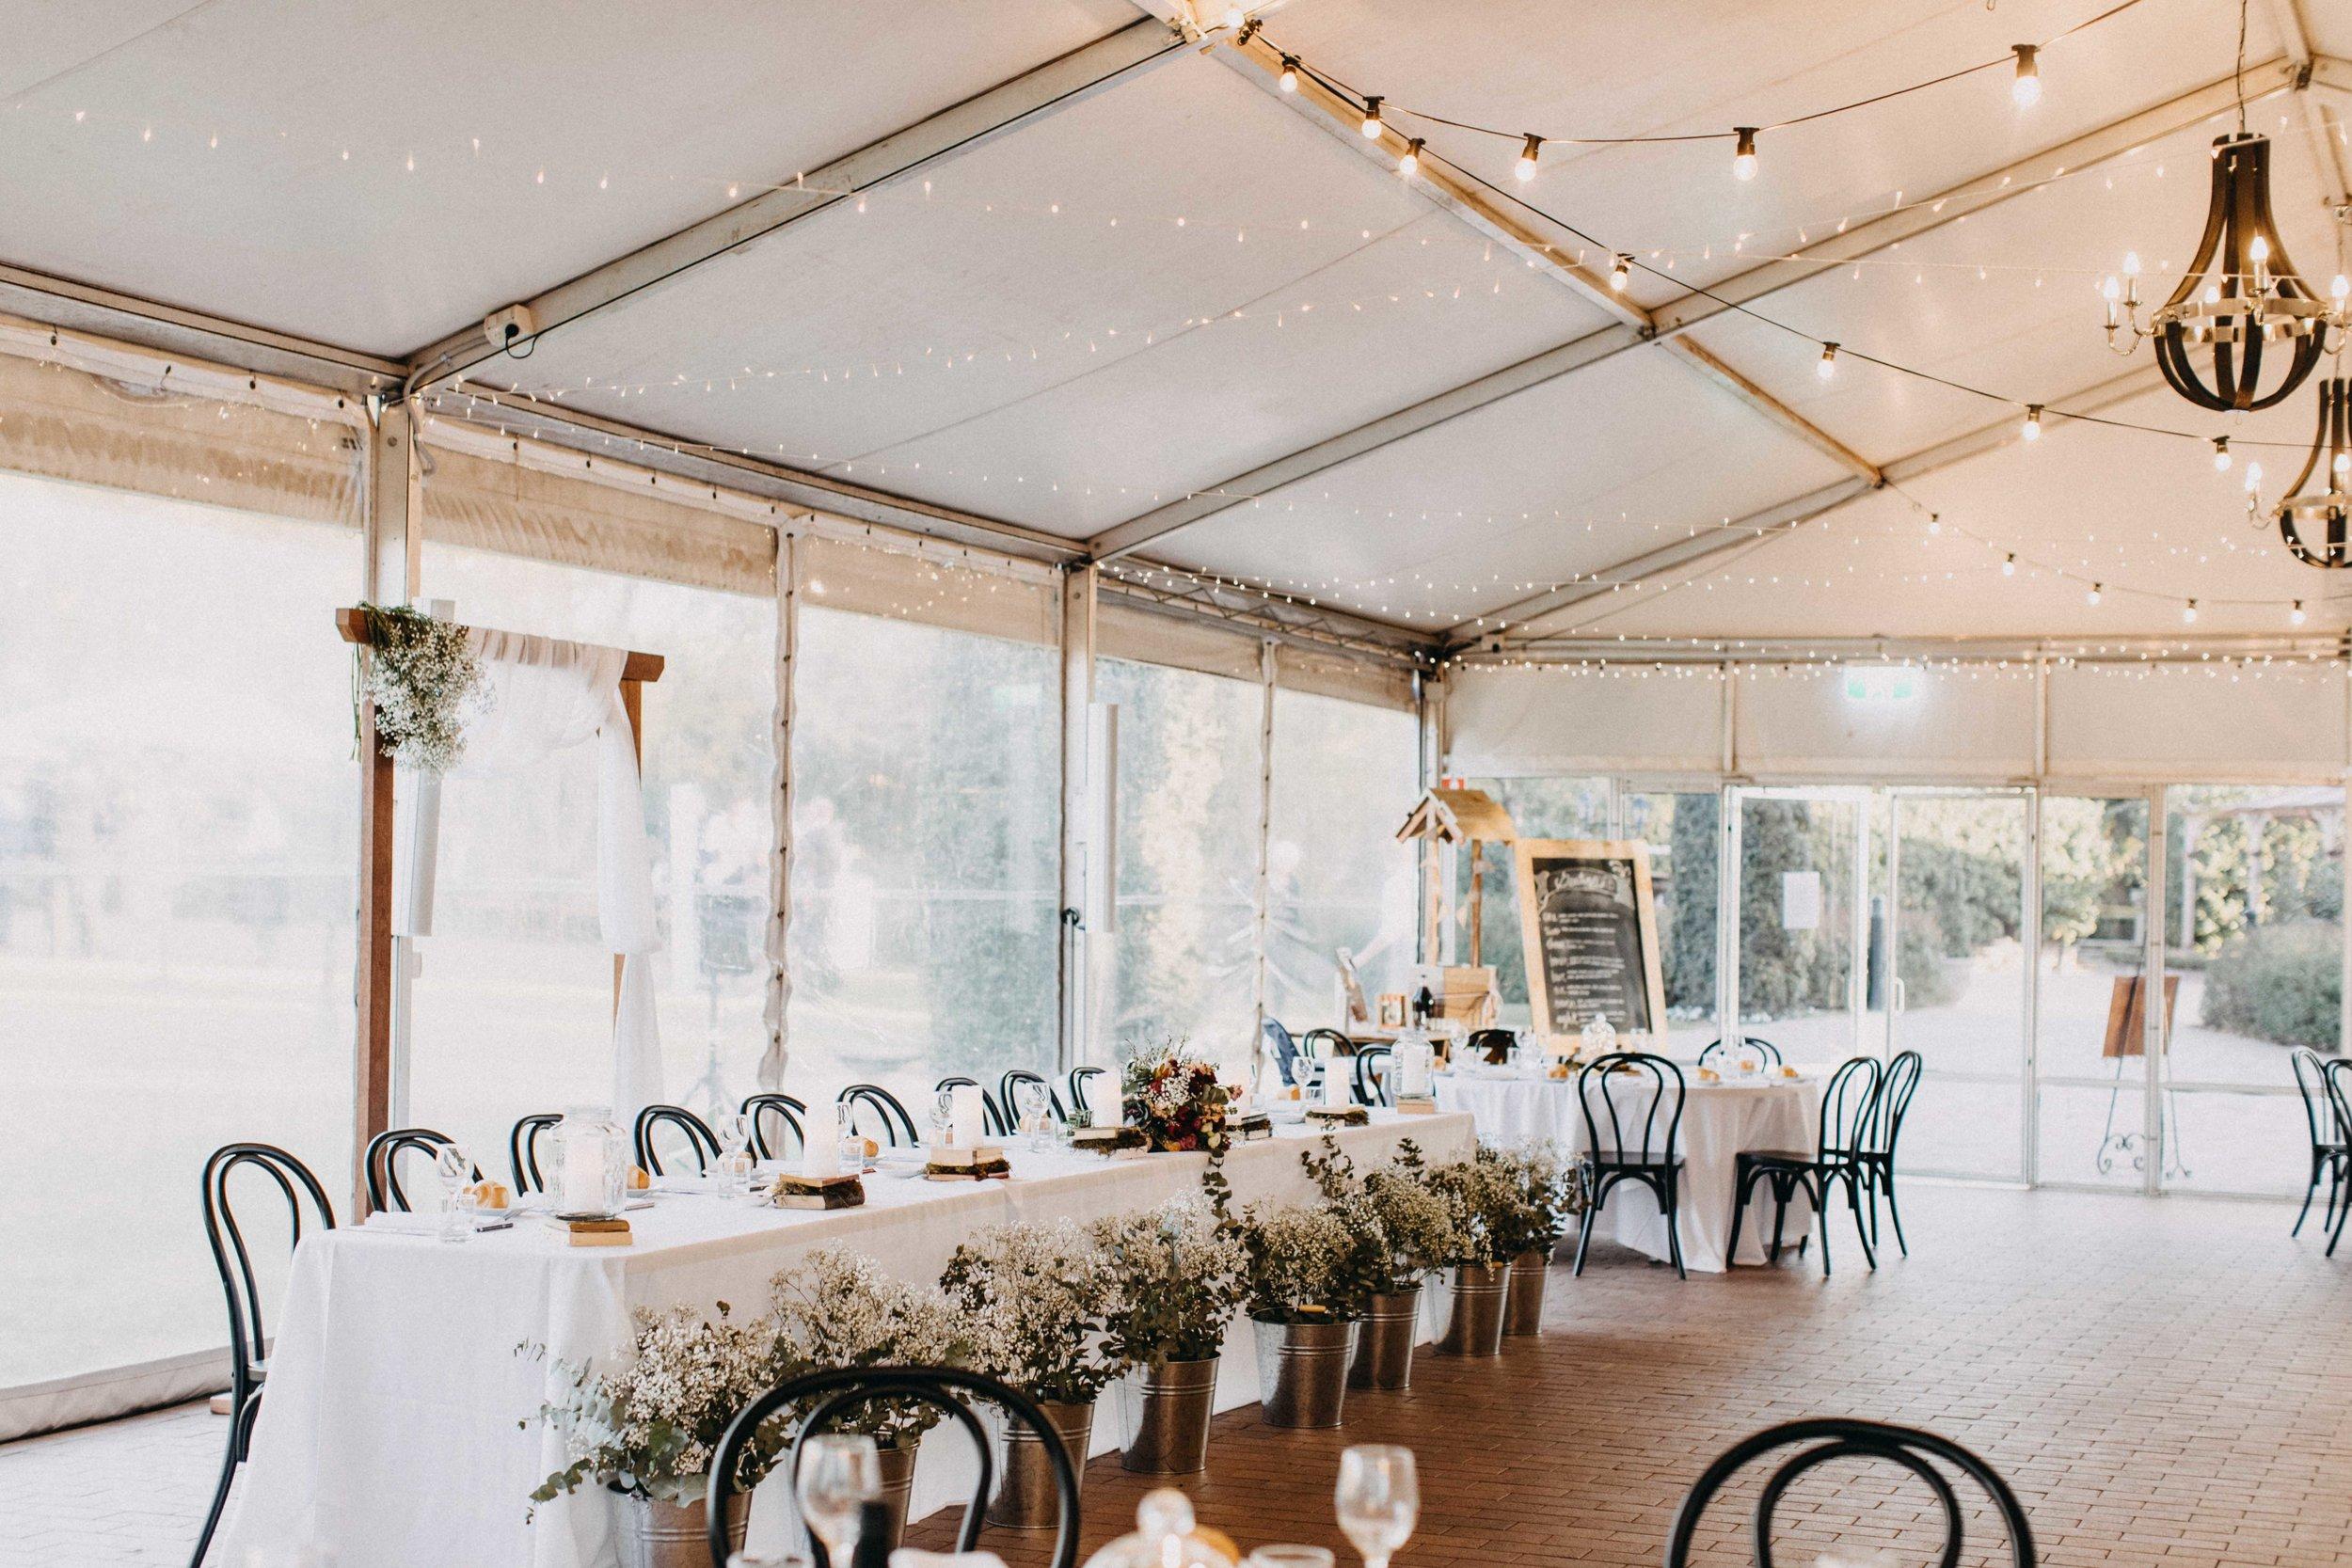 burnham-grove-camden-wedding-emilyobrienphotography-macarthur-114.jpg